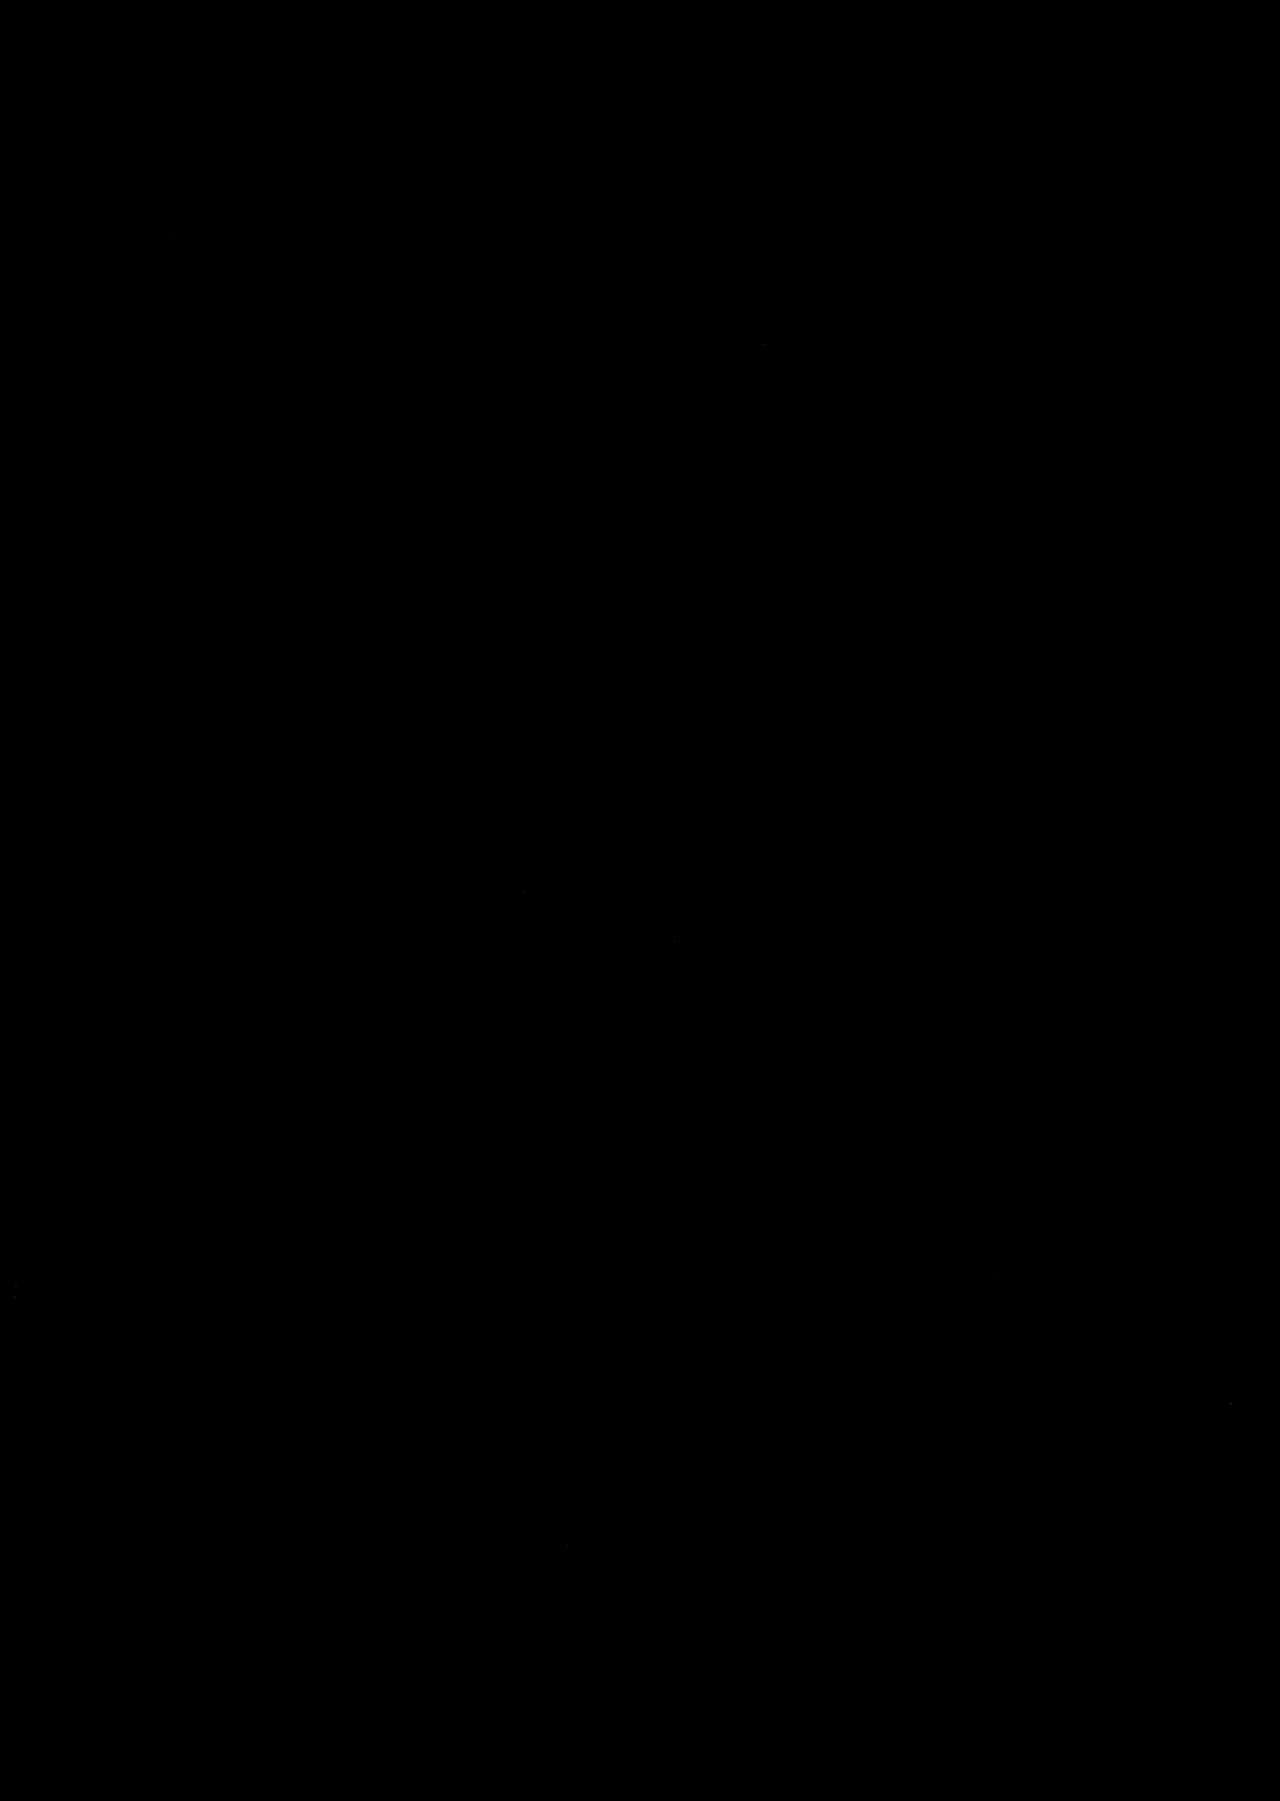 (C95) [Kamaboko Koubou (Kamaboko)] Nobukatsu-kun ga Aneue ni Horareru Hon | The Book Where Nobukatsu-kun Gets Drilled By His Sister (Fate/Grand Order) [English] [UncontrolSwitchOverflow] 25